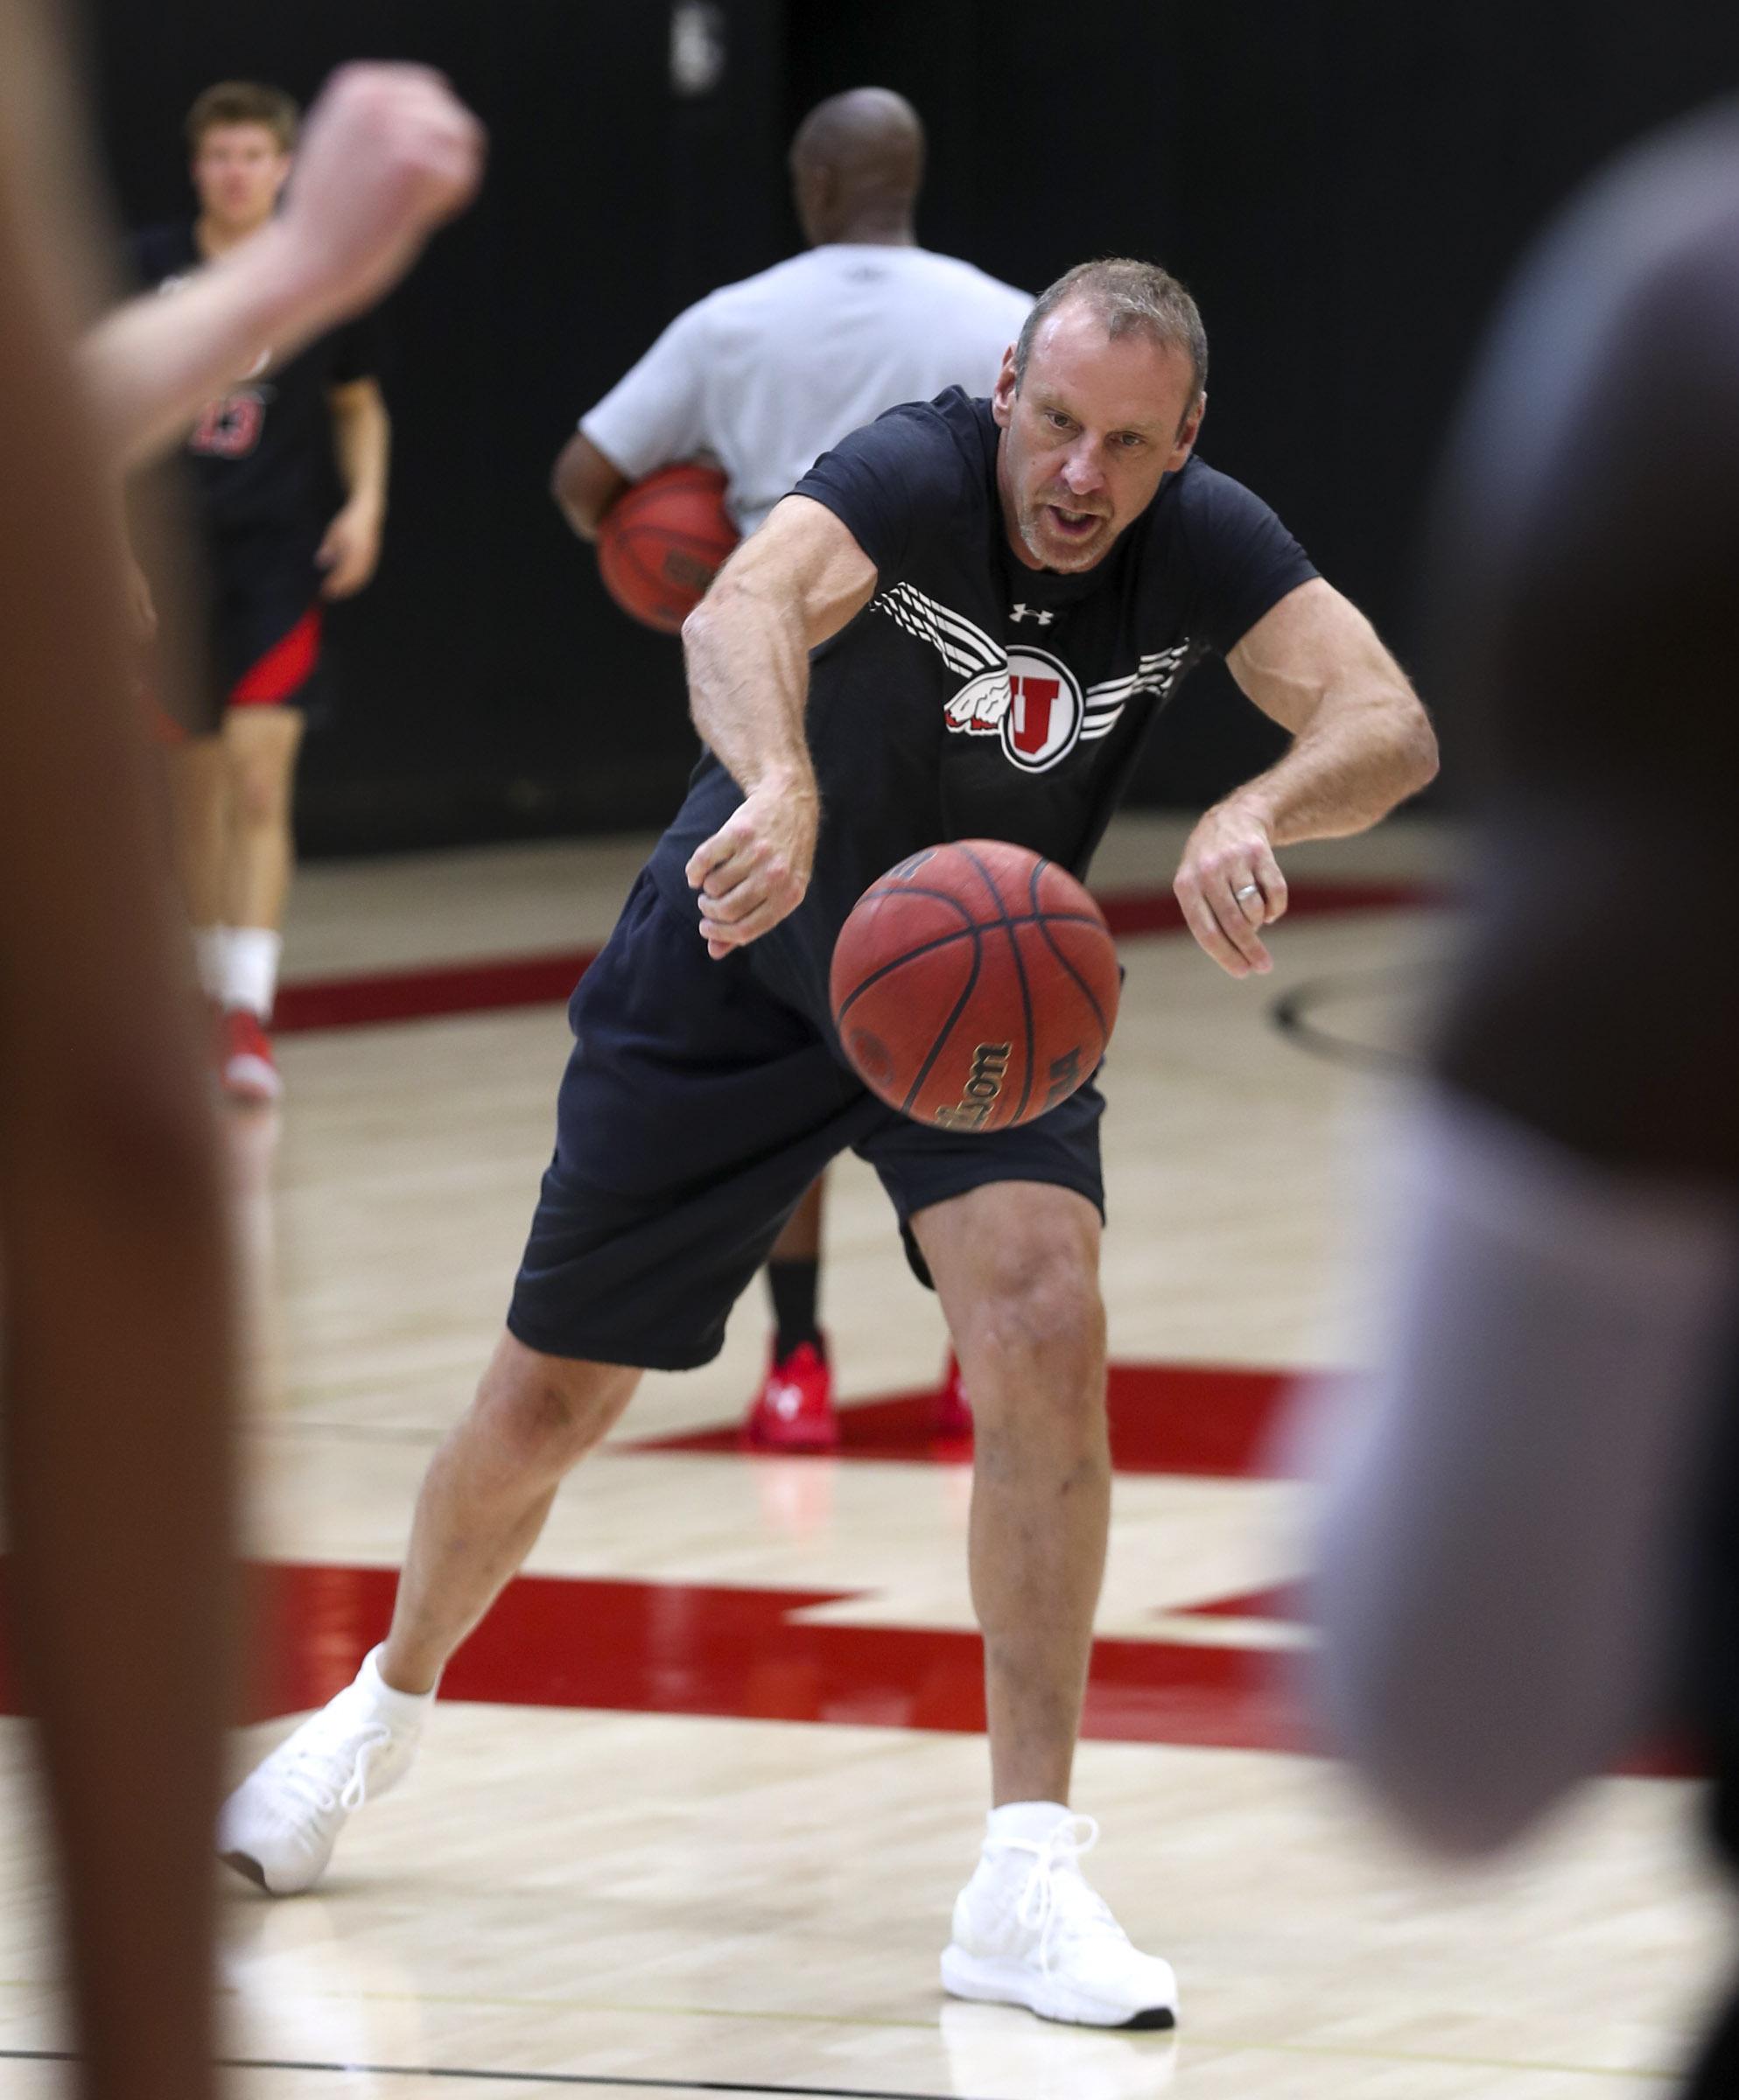 Utah head coach Larry Krystkowiak passes balls to his post players as the University of Utah men's basketball program begins official practices at the Jon M. and Karen Huntsman Basketball Facility in Salt Lake City on Wednesday, Sept. 25, 2019.